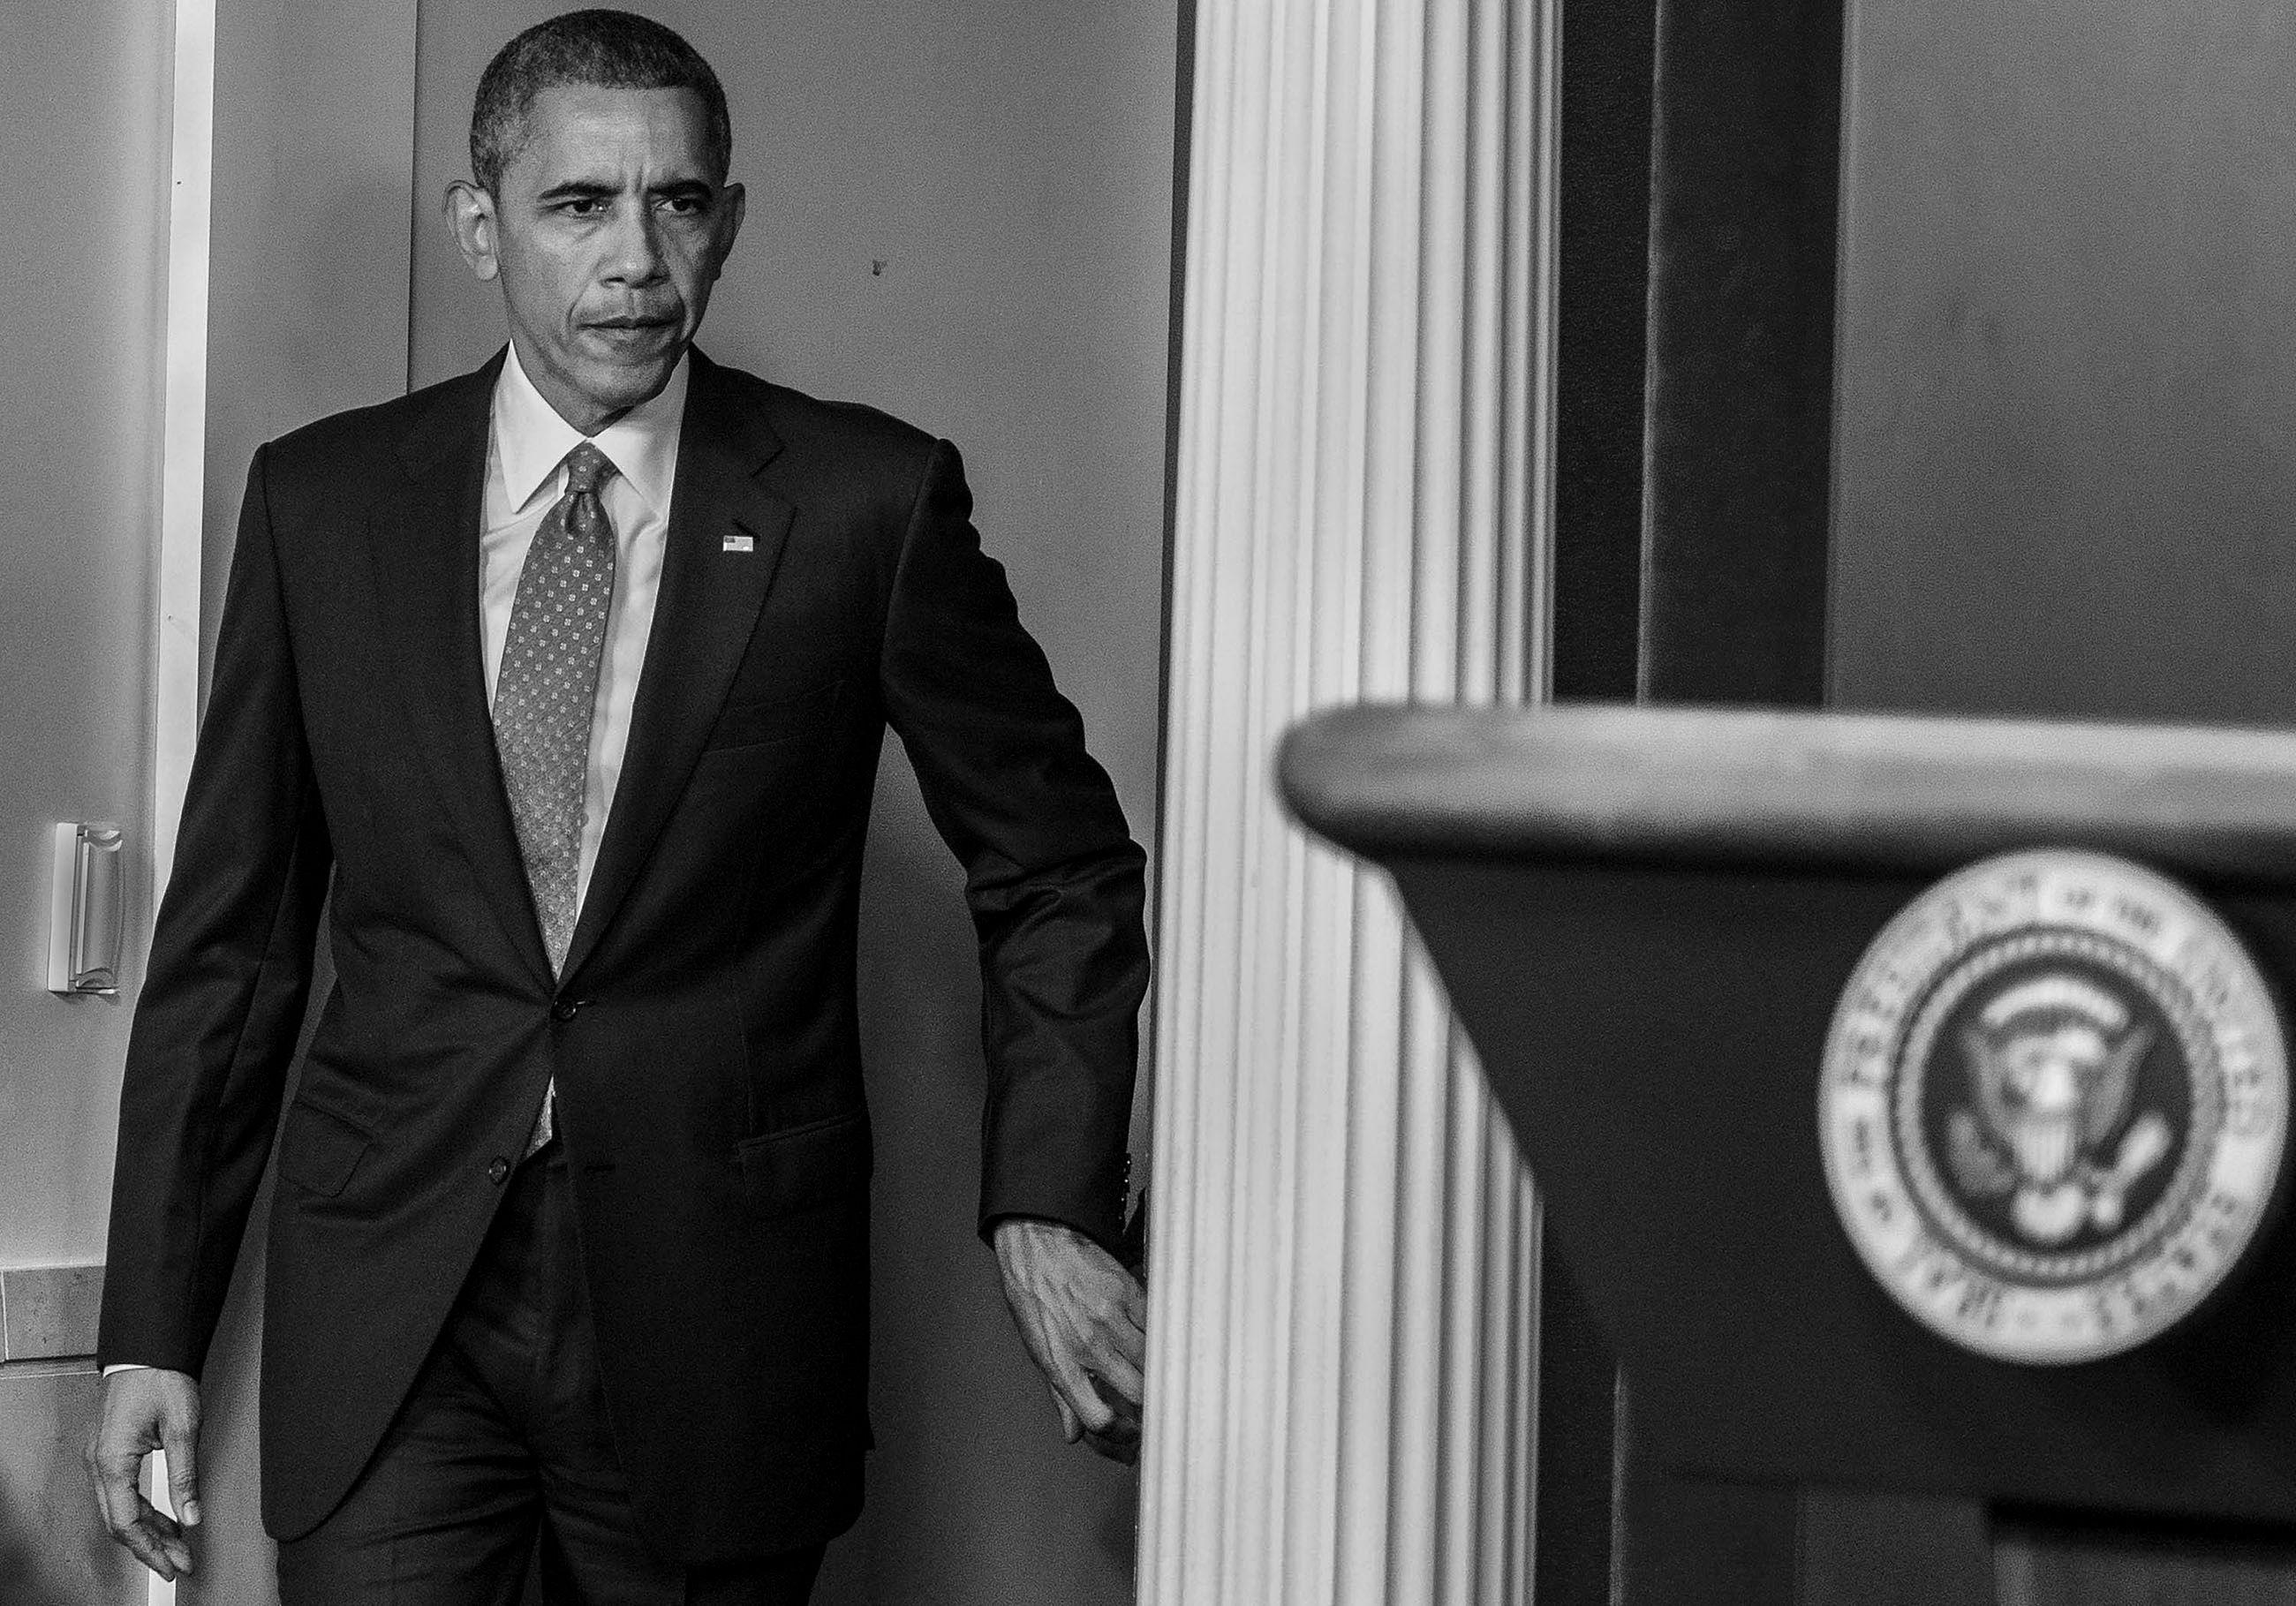 ObamaWalksInWEB.jpg